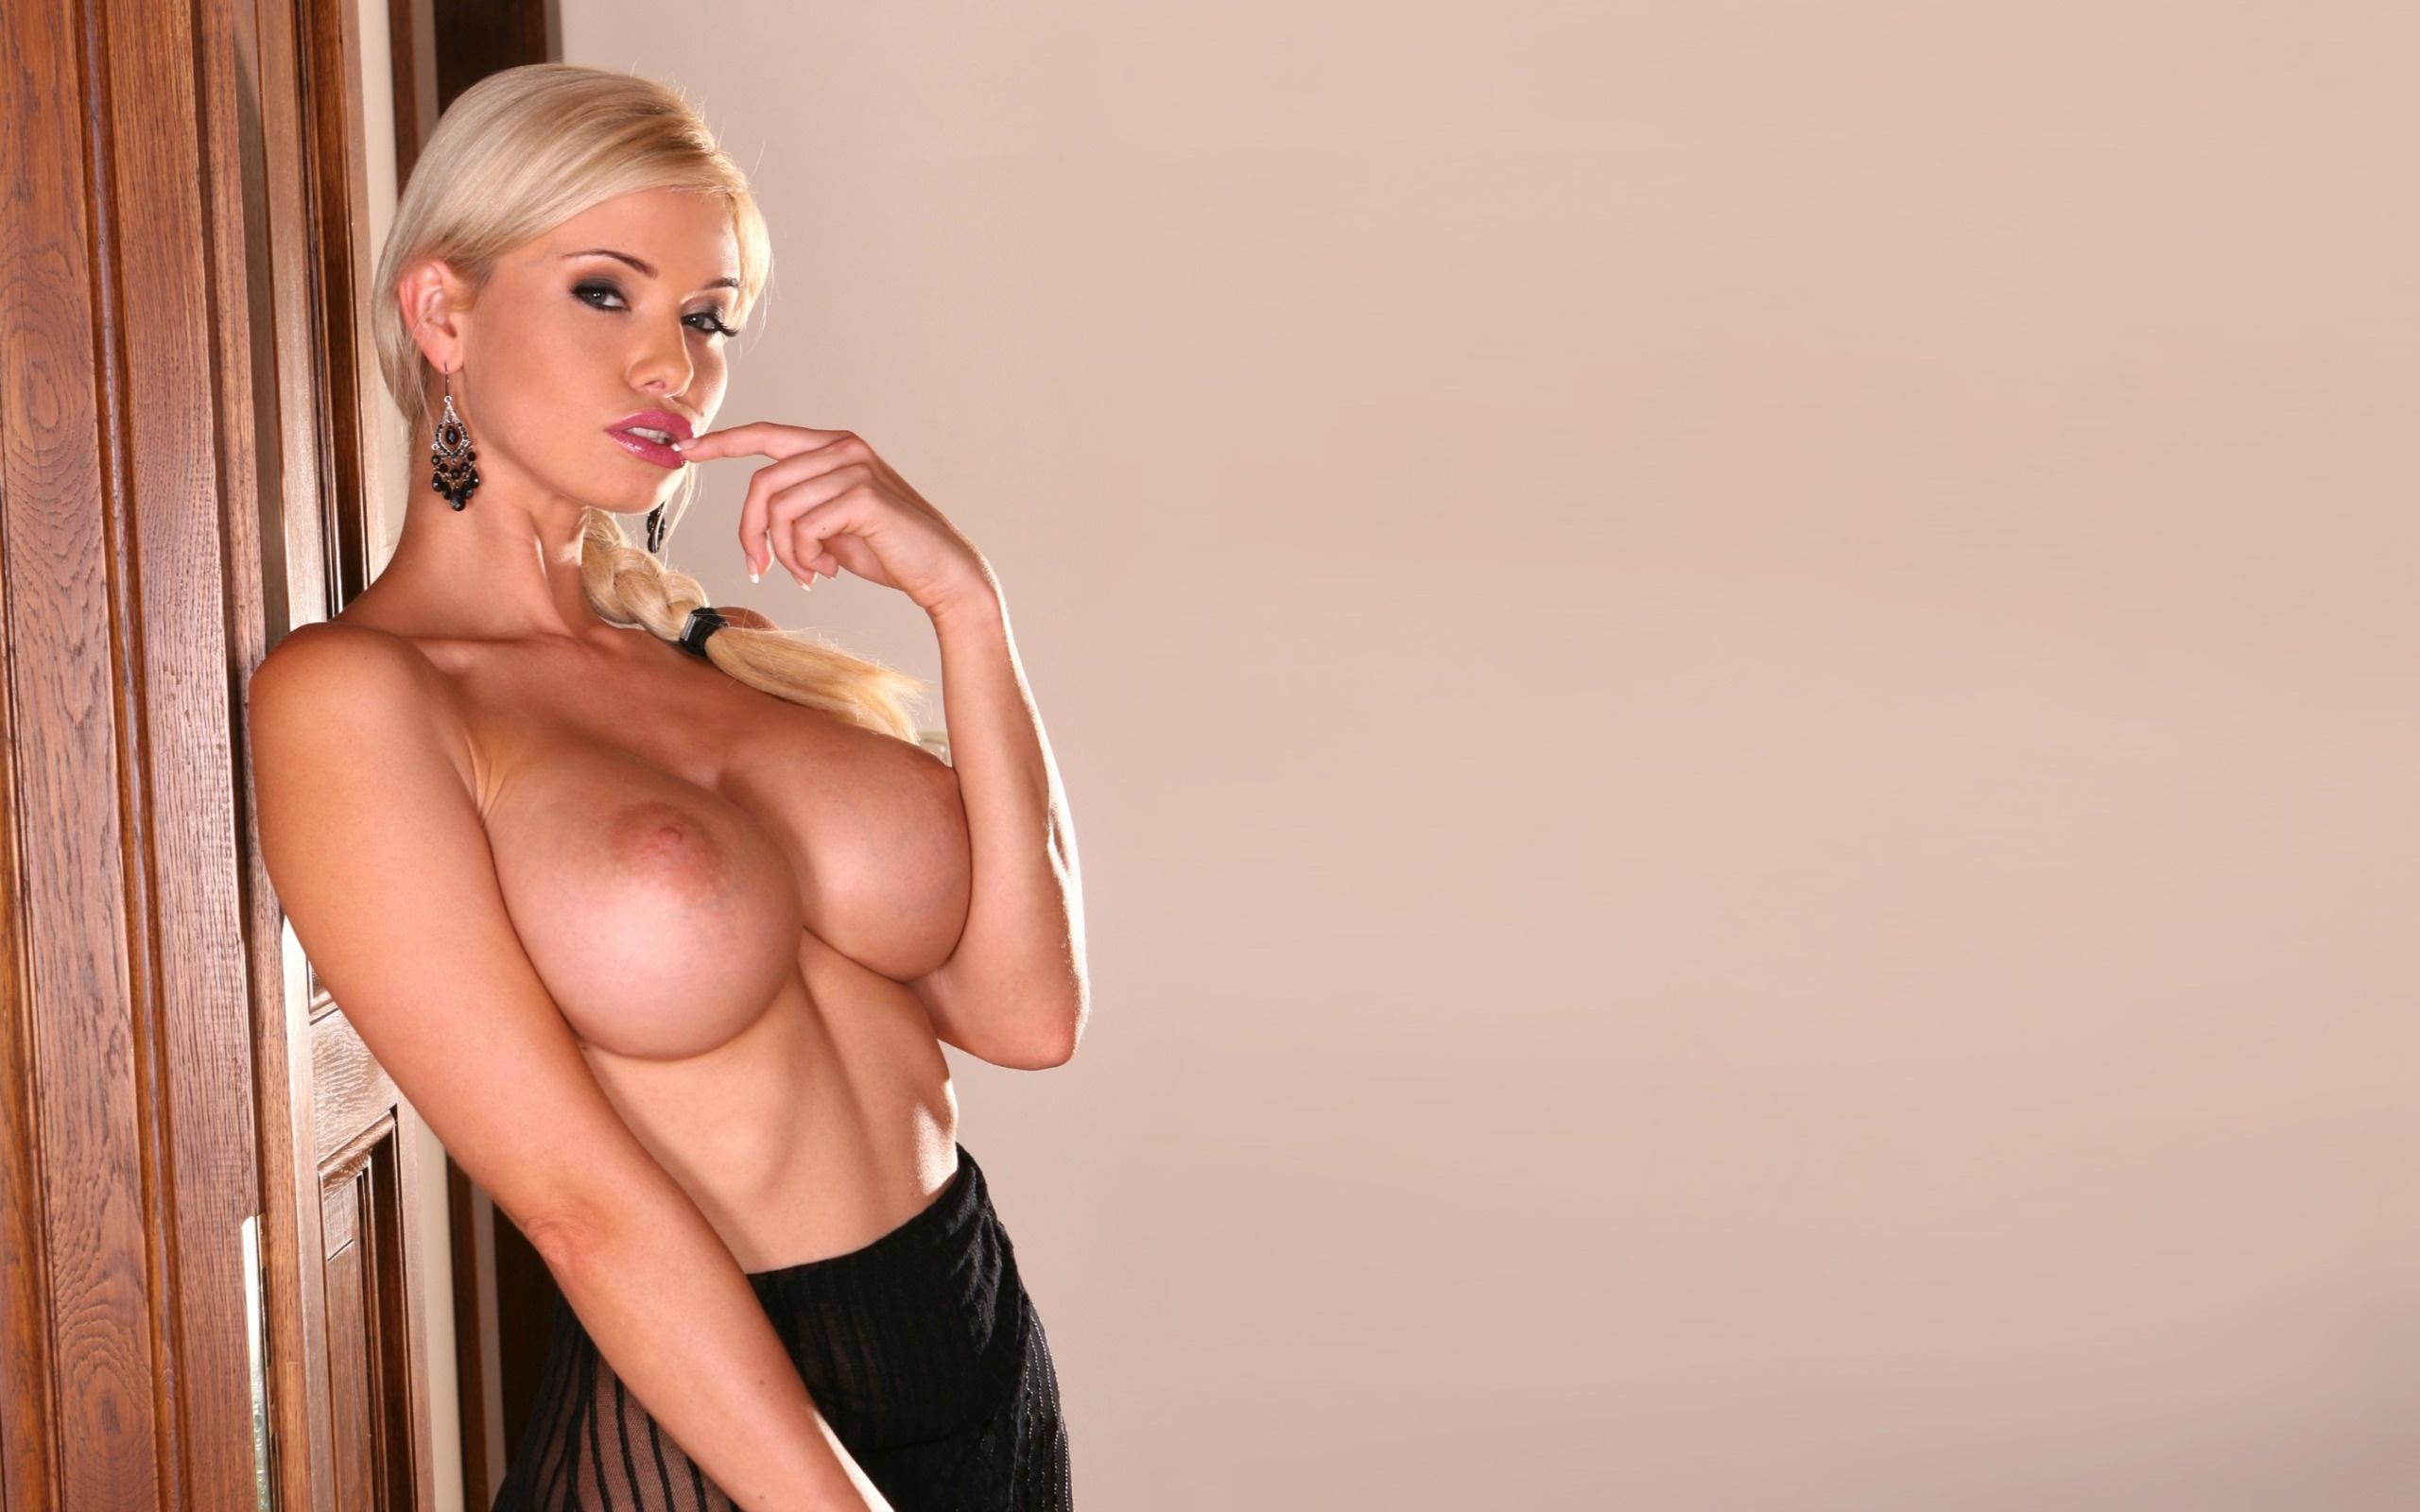 Wallpaper Kathy Lee, Caylian Curtis, Model, Blonde, Sexy -4329